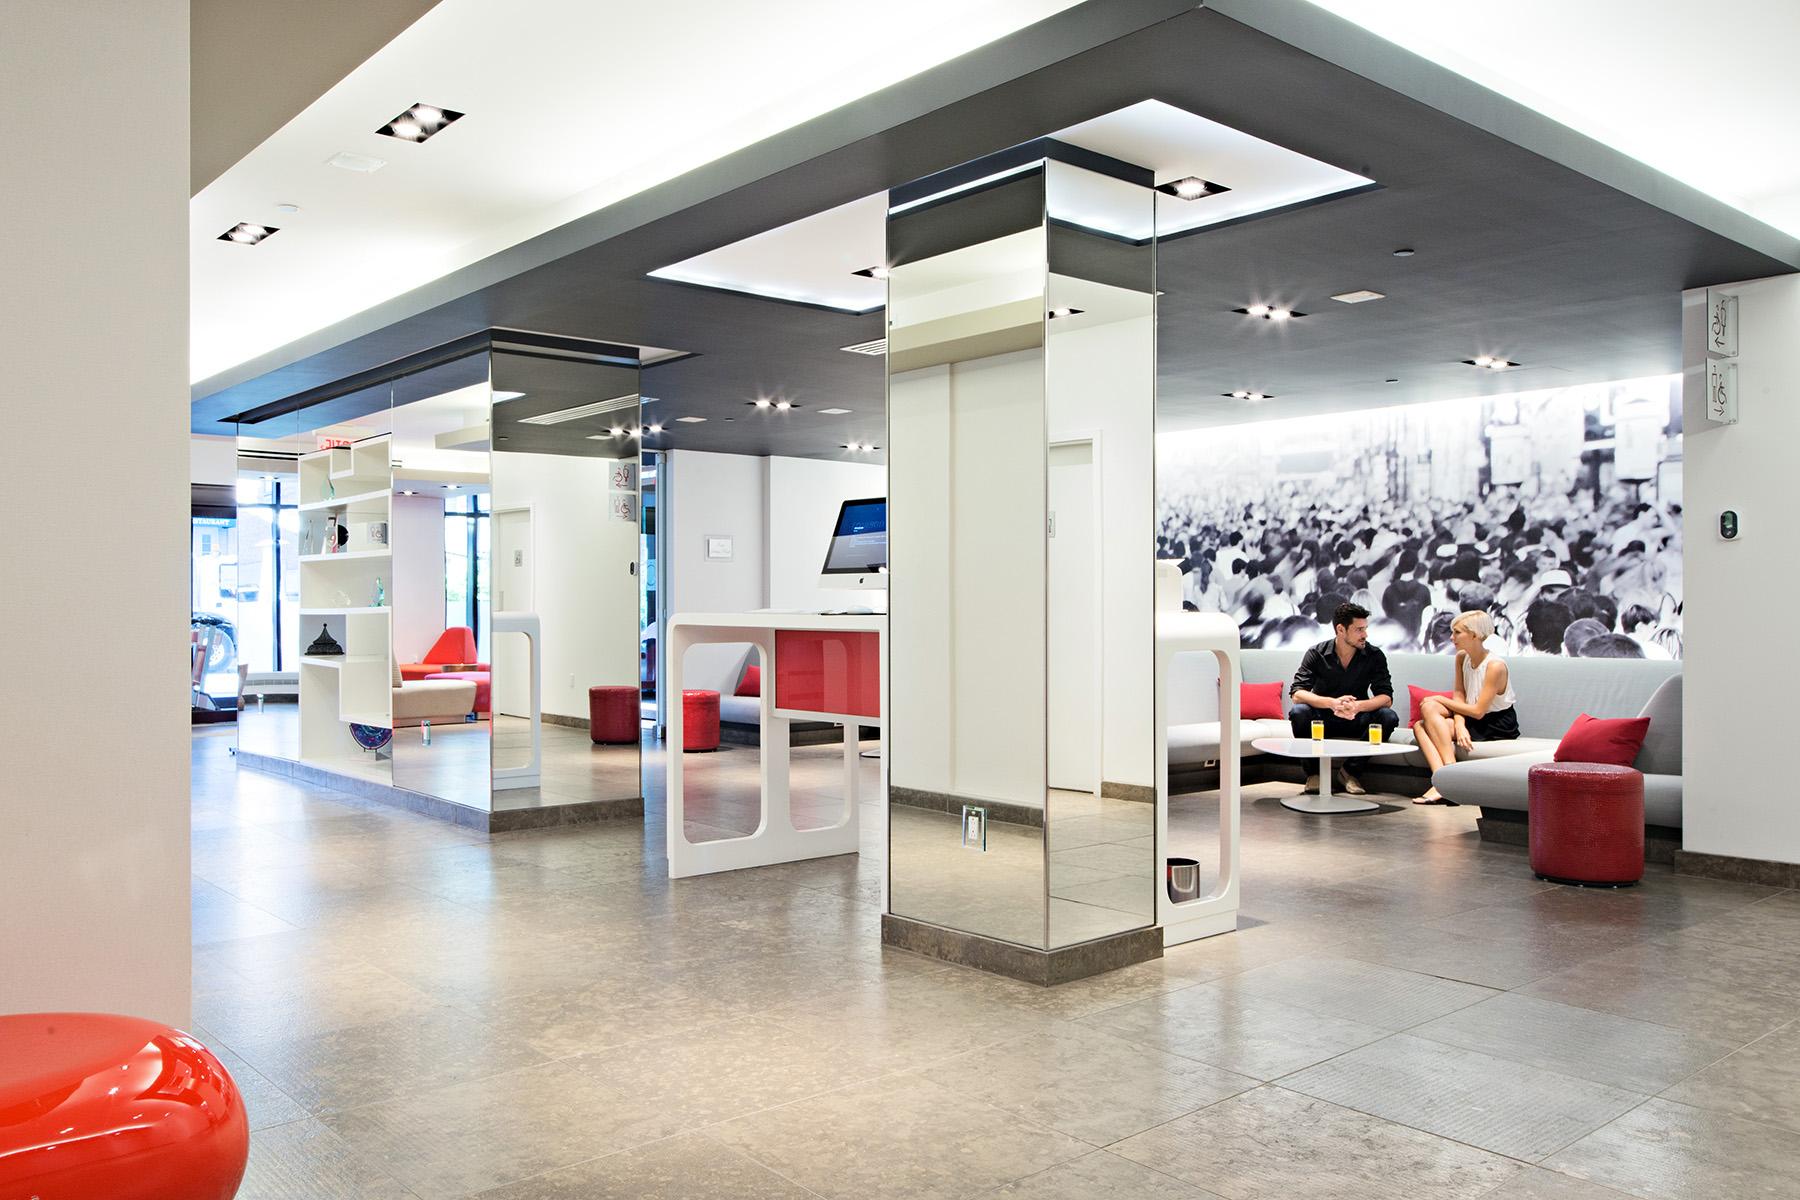 interiors-hospitality-lifestyle-novotel-hotel-montreal-003